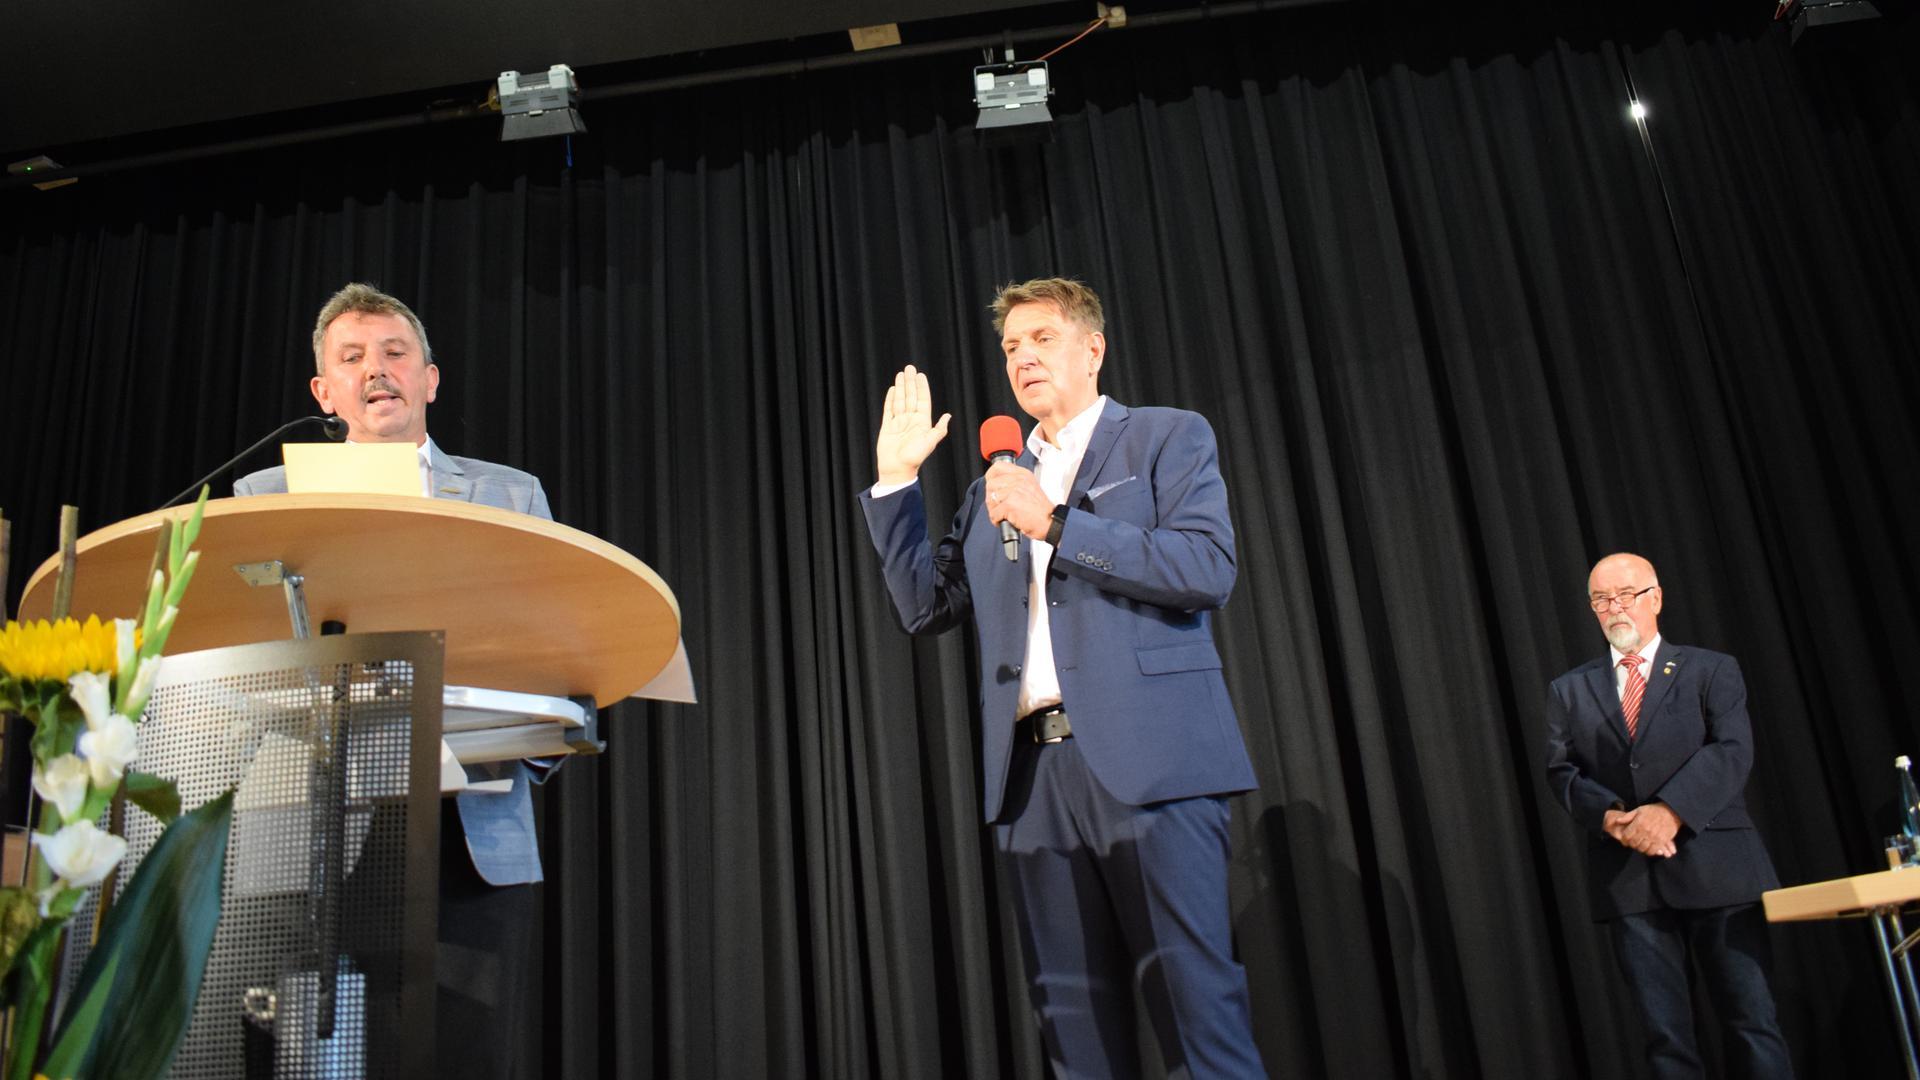 Feierlicher Moment: Markus Bechler legt im Bürgerhaus seinen Amtseid ab.